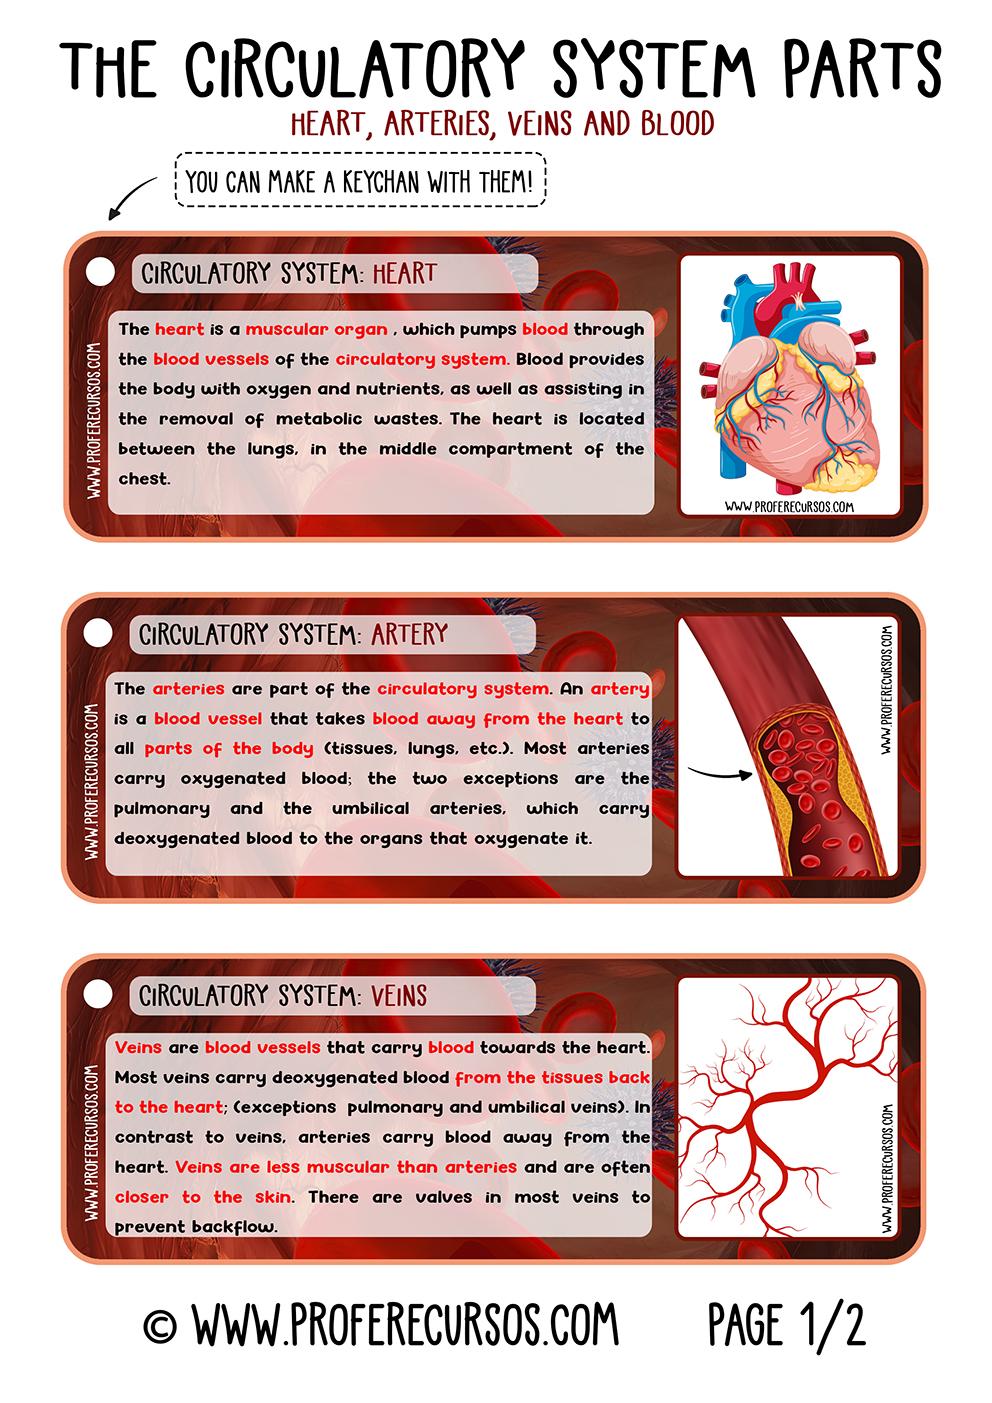 Circulatory-System-Organs